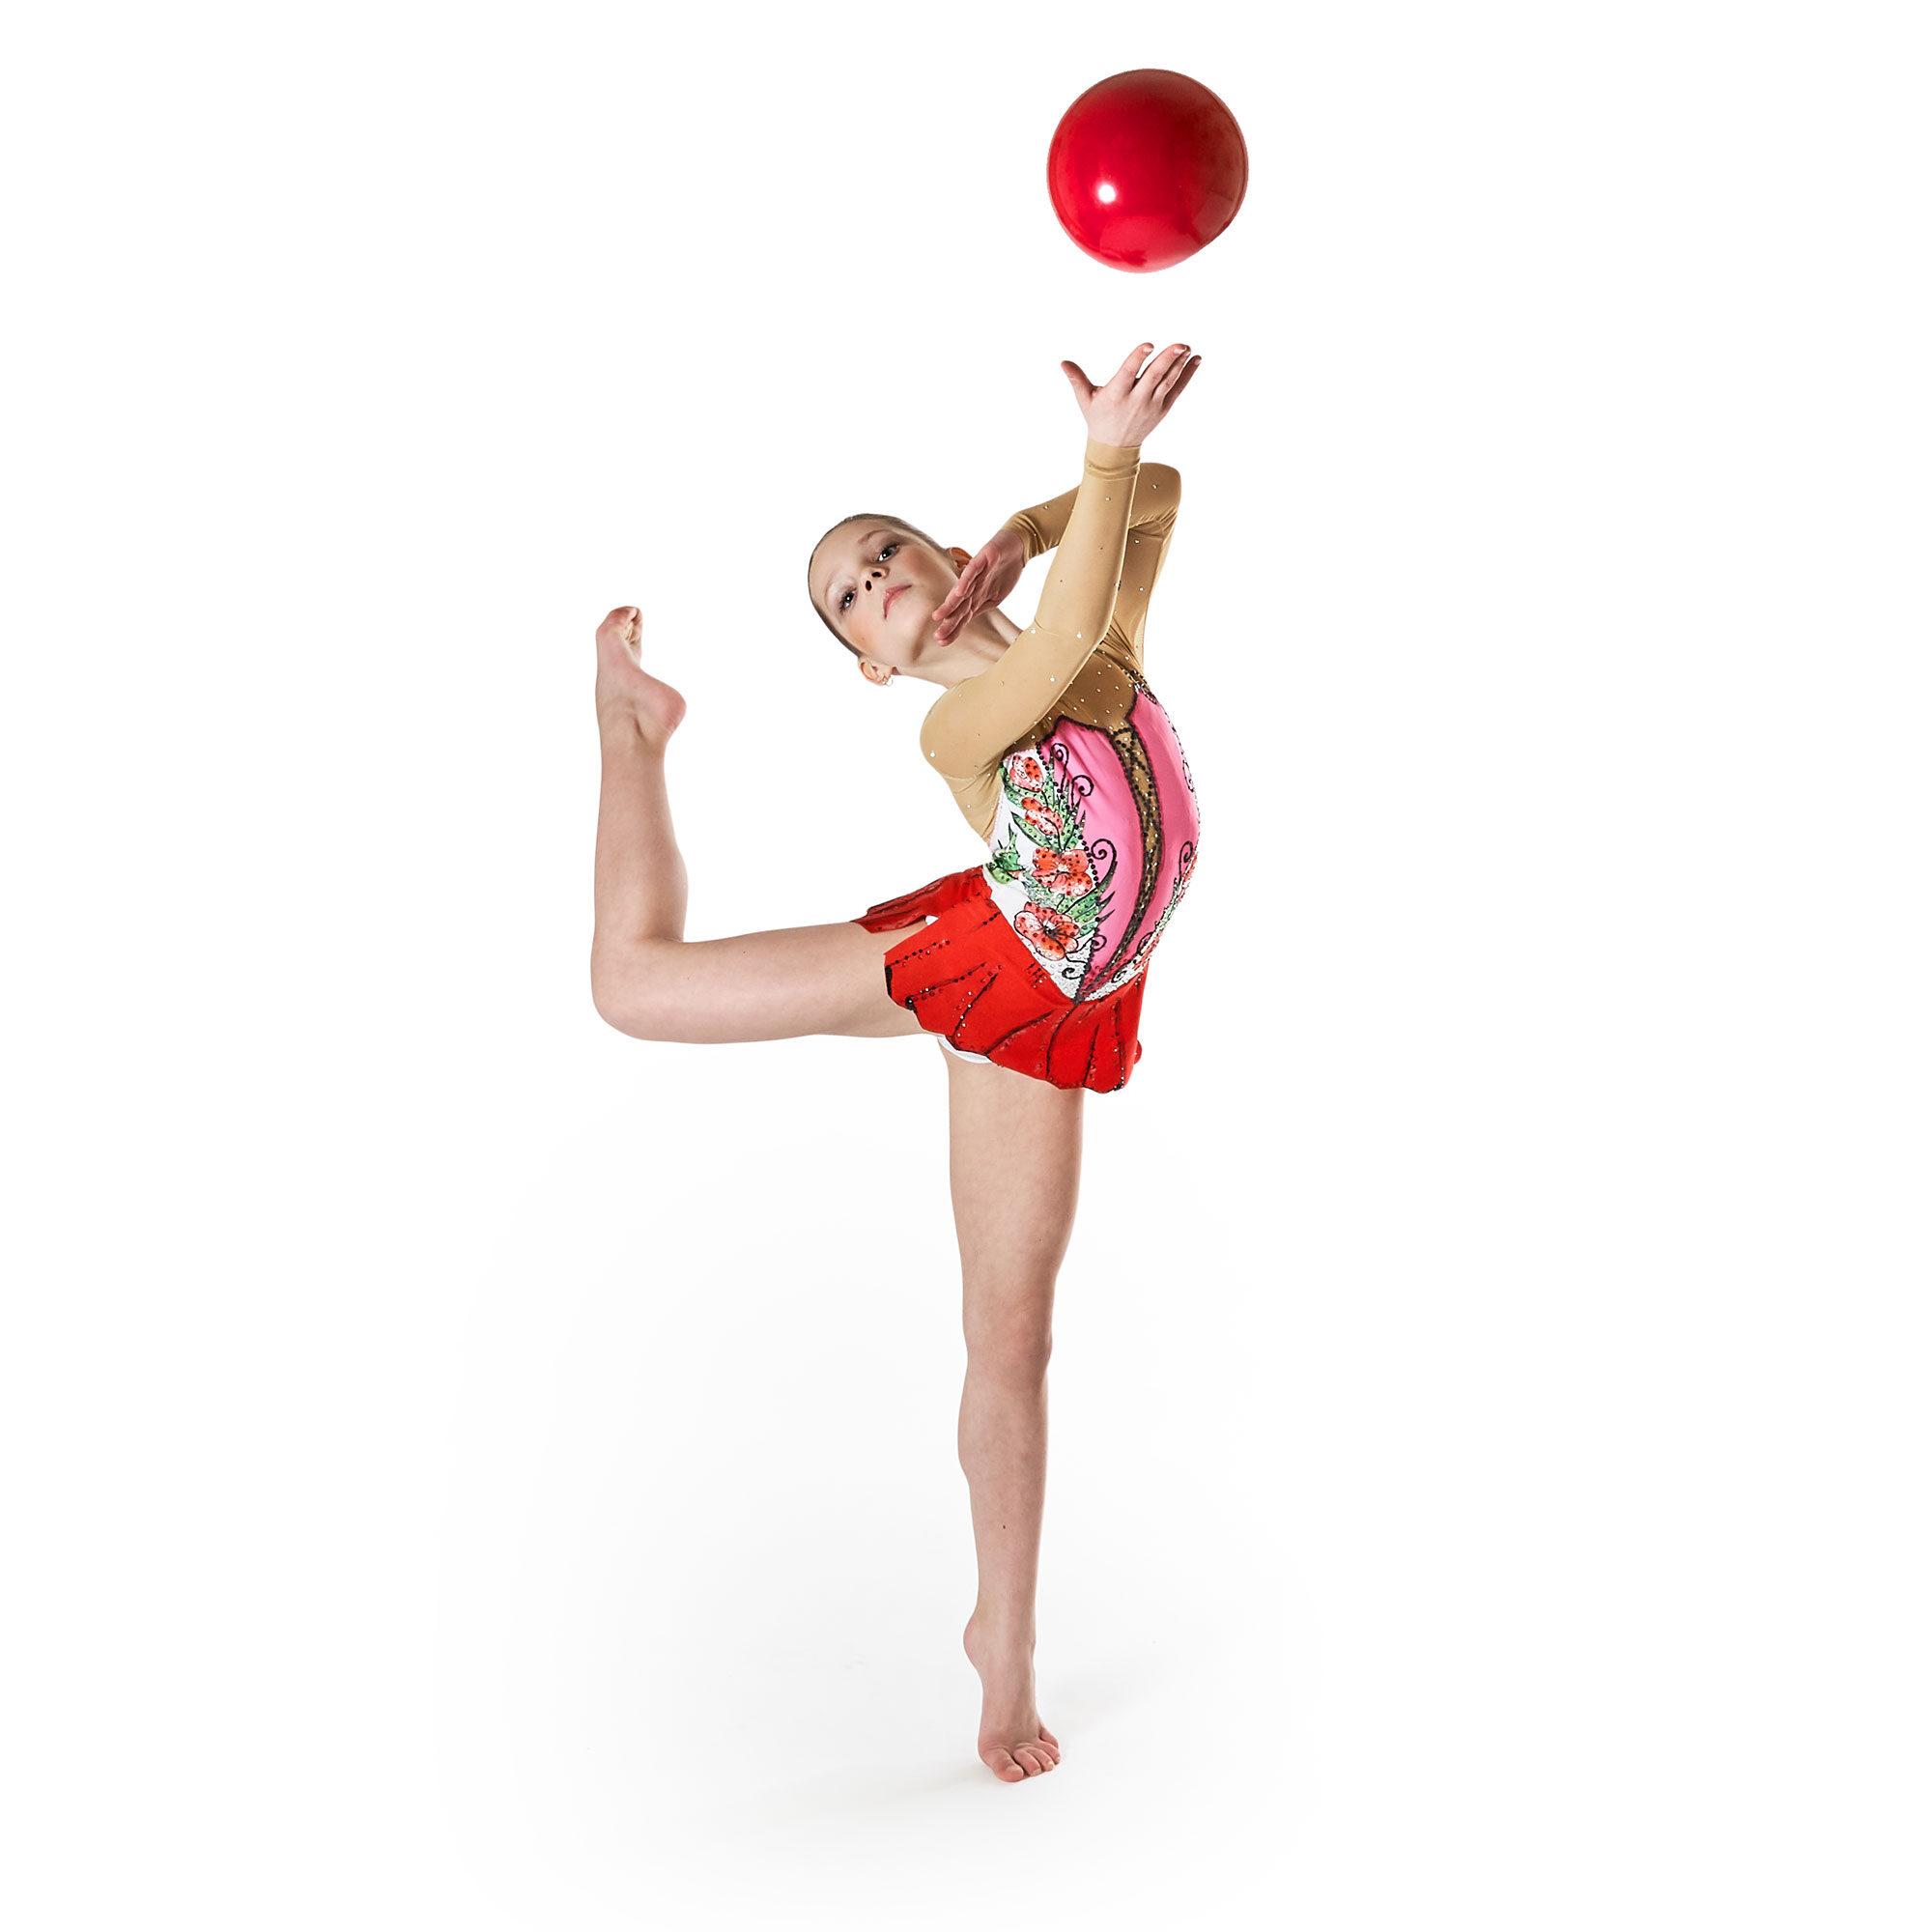 White, rose, red, green, black, mesh Rhythmic Gymnastics Leotard № 44 for competitions